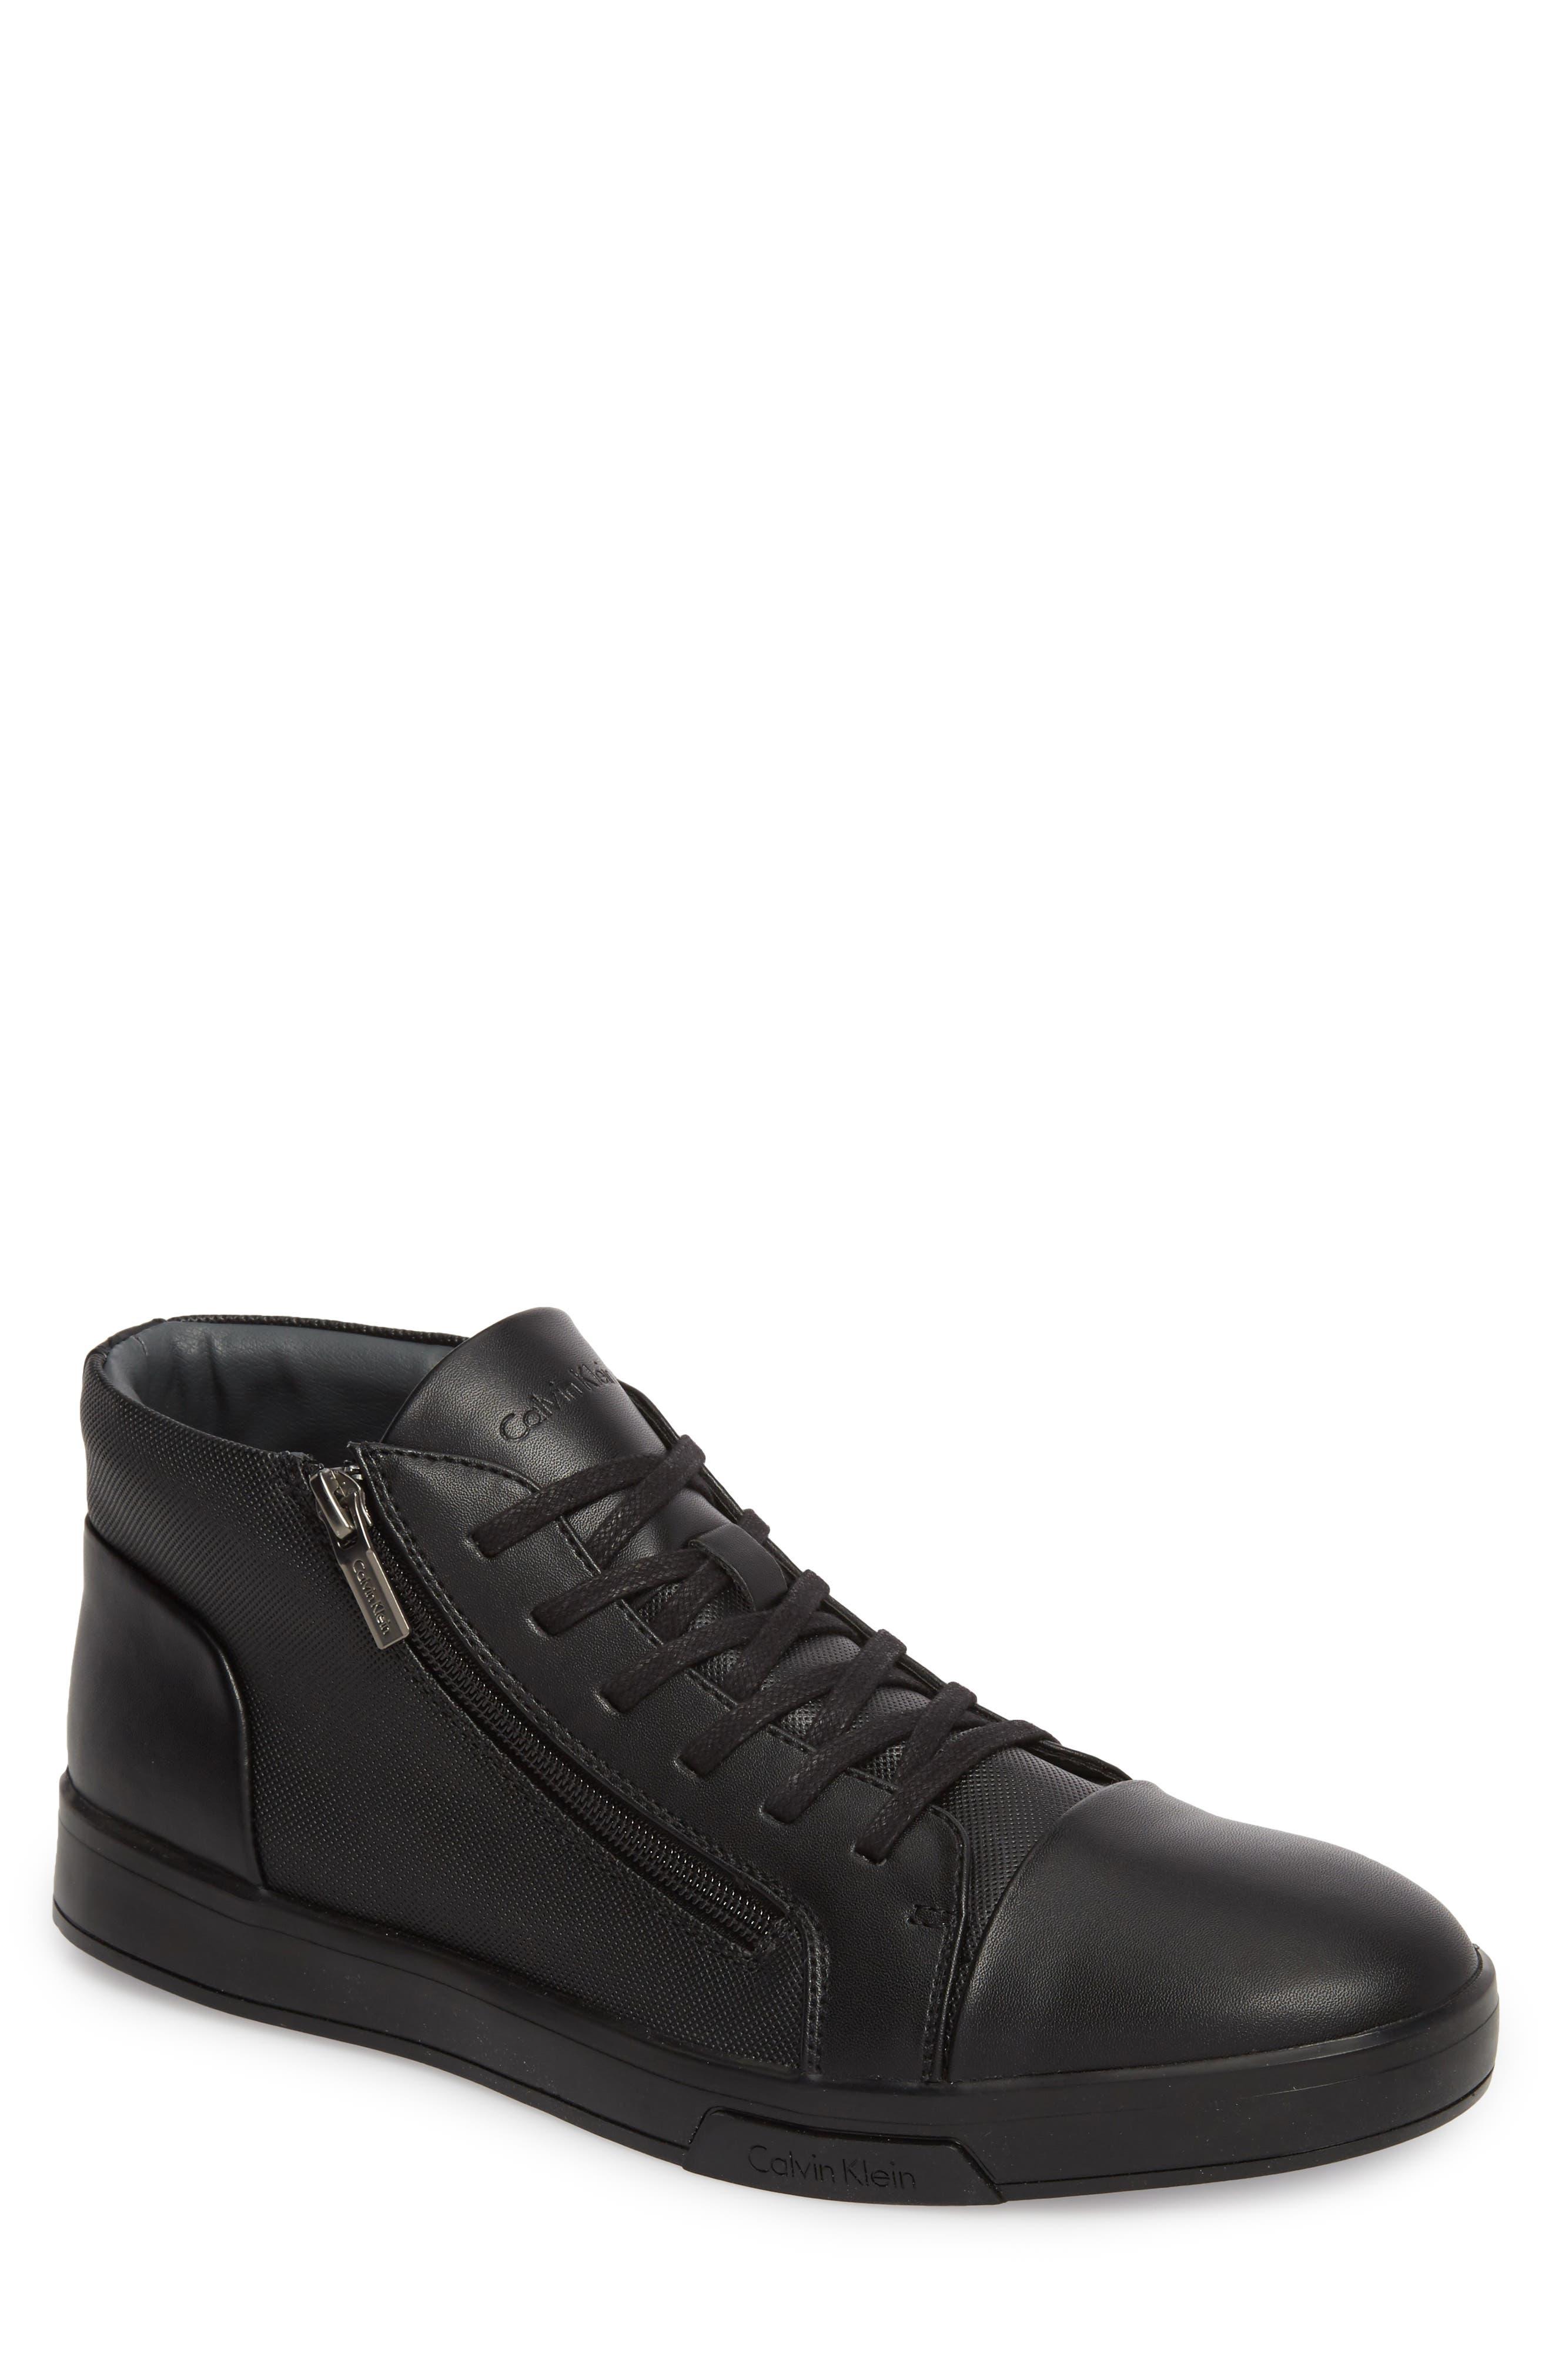 Bozeman High Top Sneaker,                             Main thumbnail 1, color,